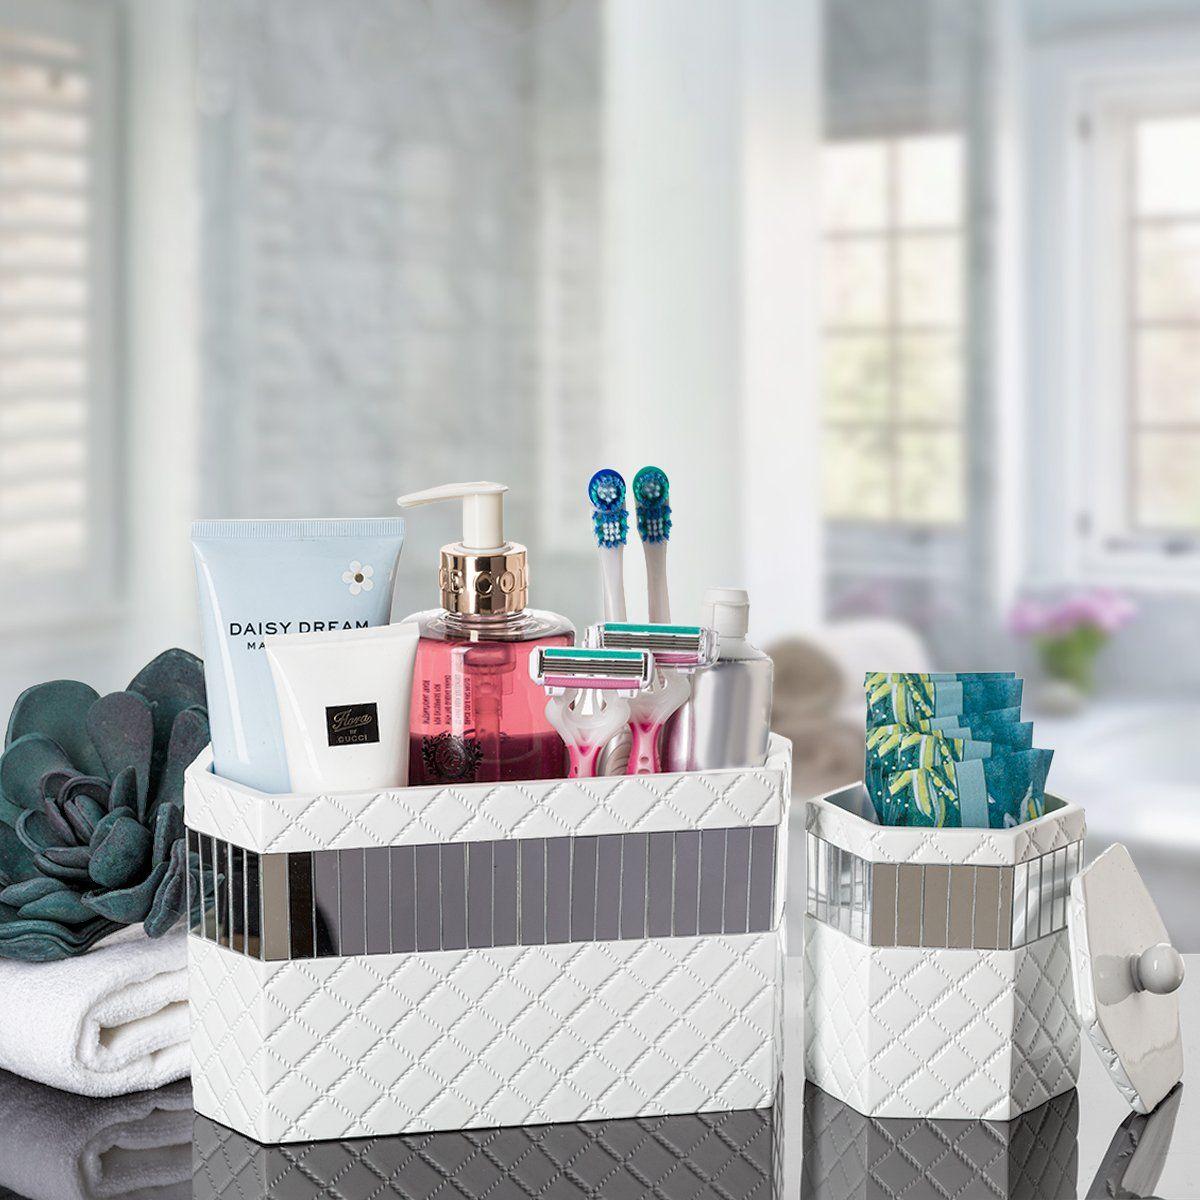 Makeup Brush Holder Quilted Mirror Bathroom Organizer Countertop Decorative Bathroom Hair Accessories Storage It Cosmetics Brushes Organize Bathroom Countertop